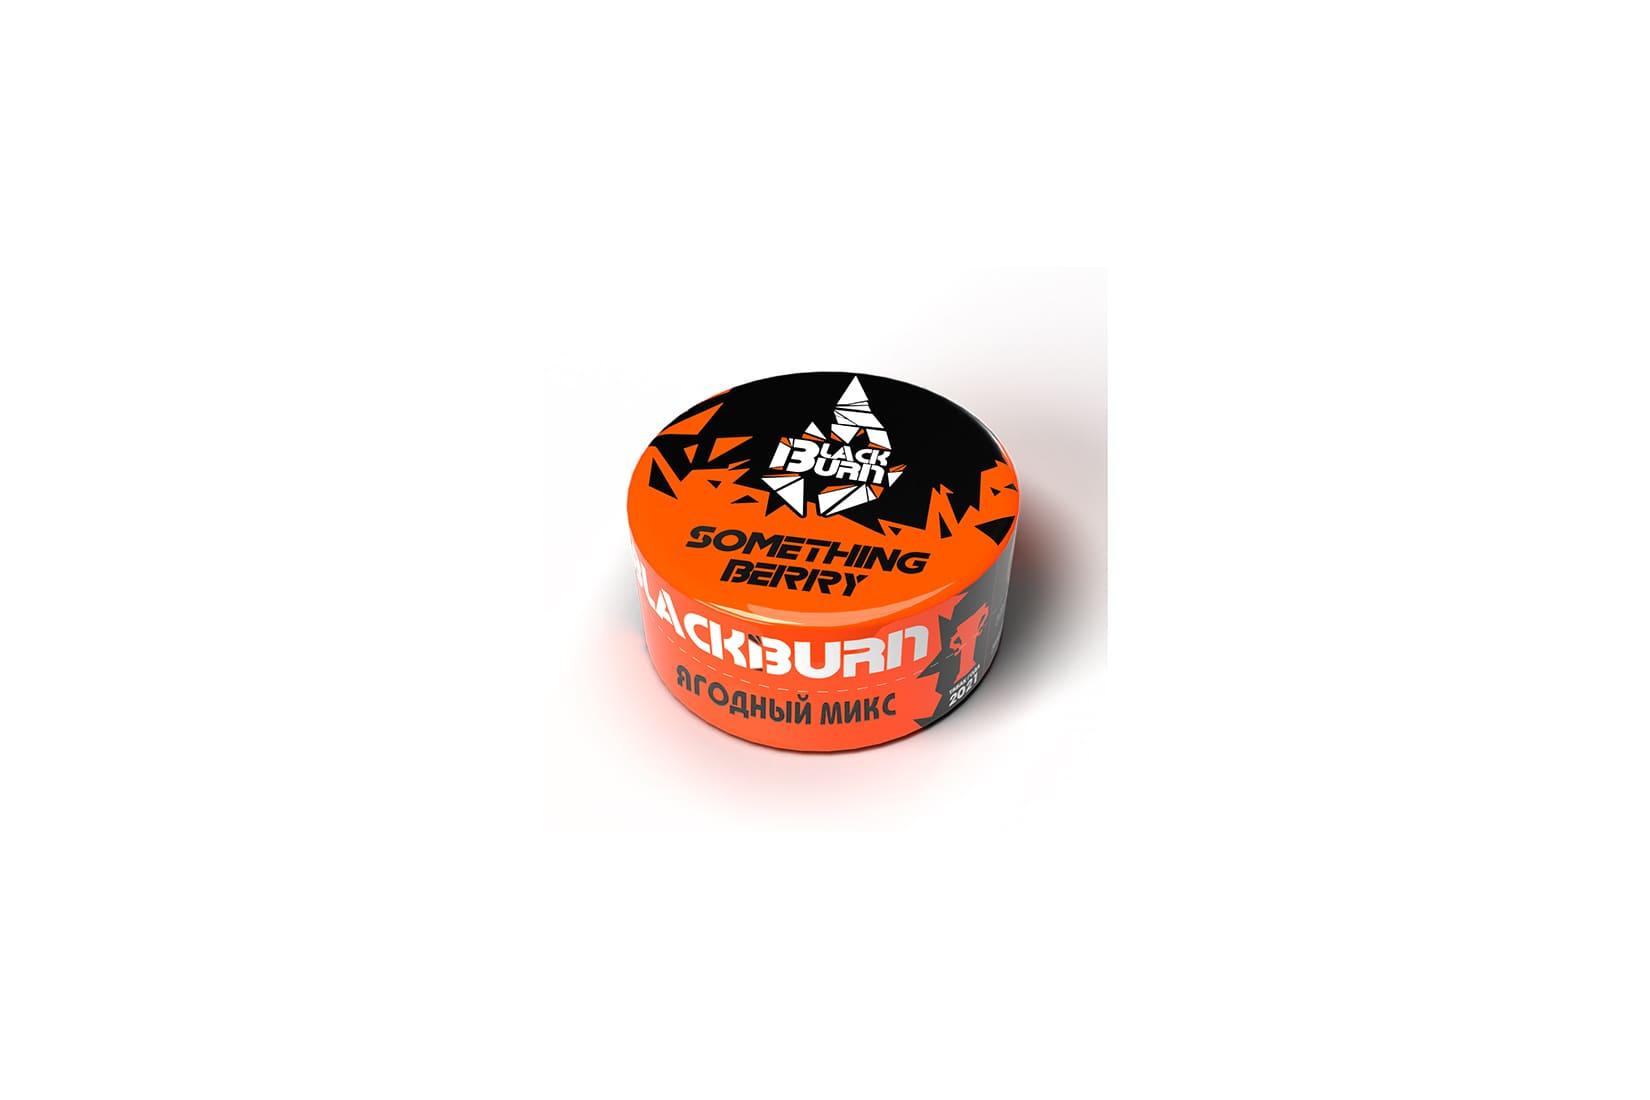 Табак для кальяна Black Burn SOMETHING BERRY – описание, миксы, отзывы